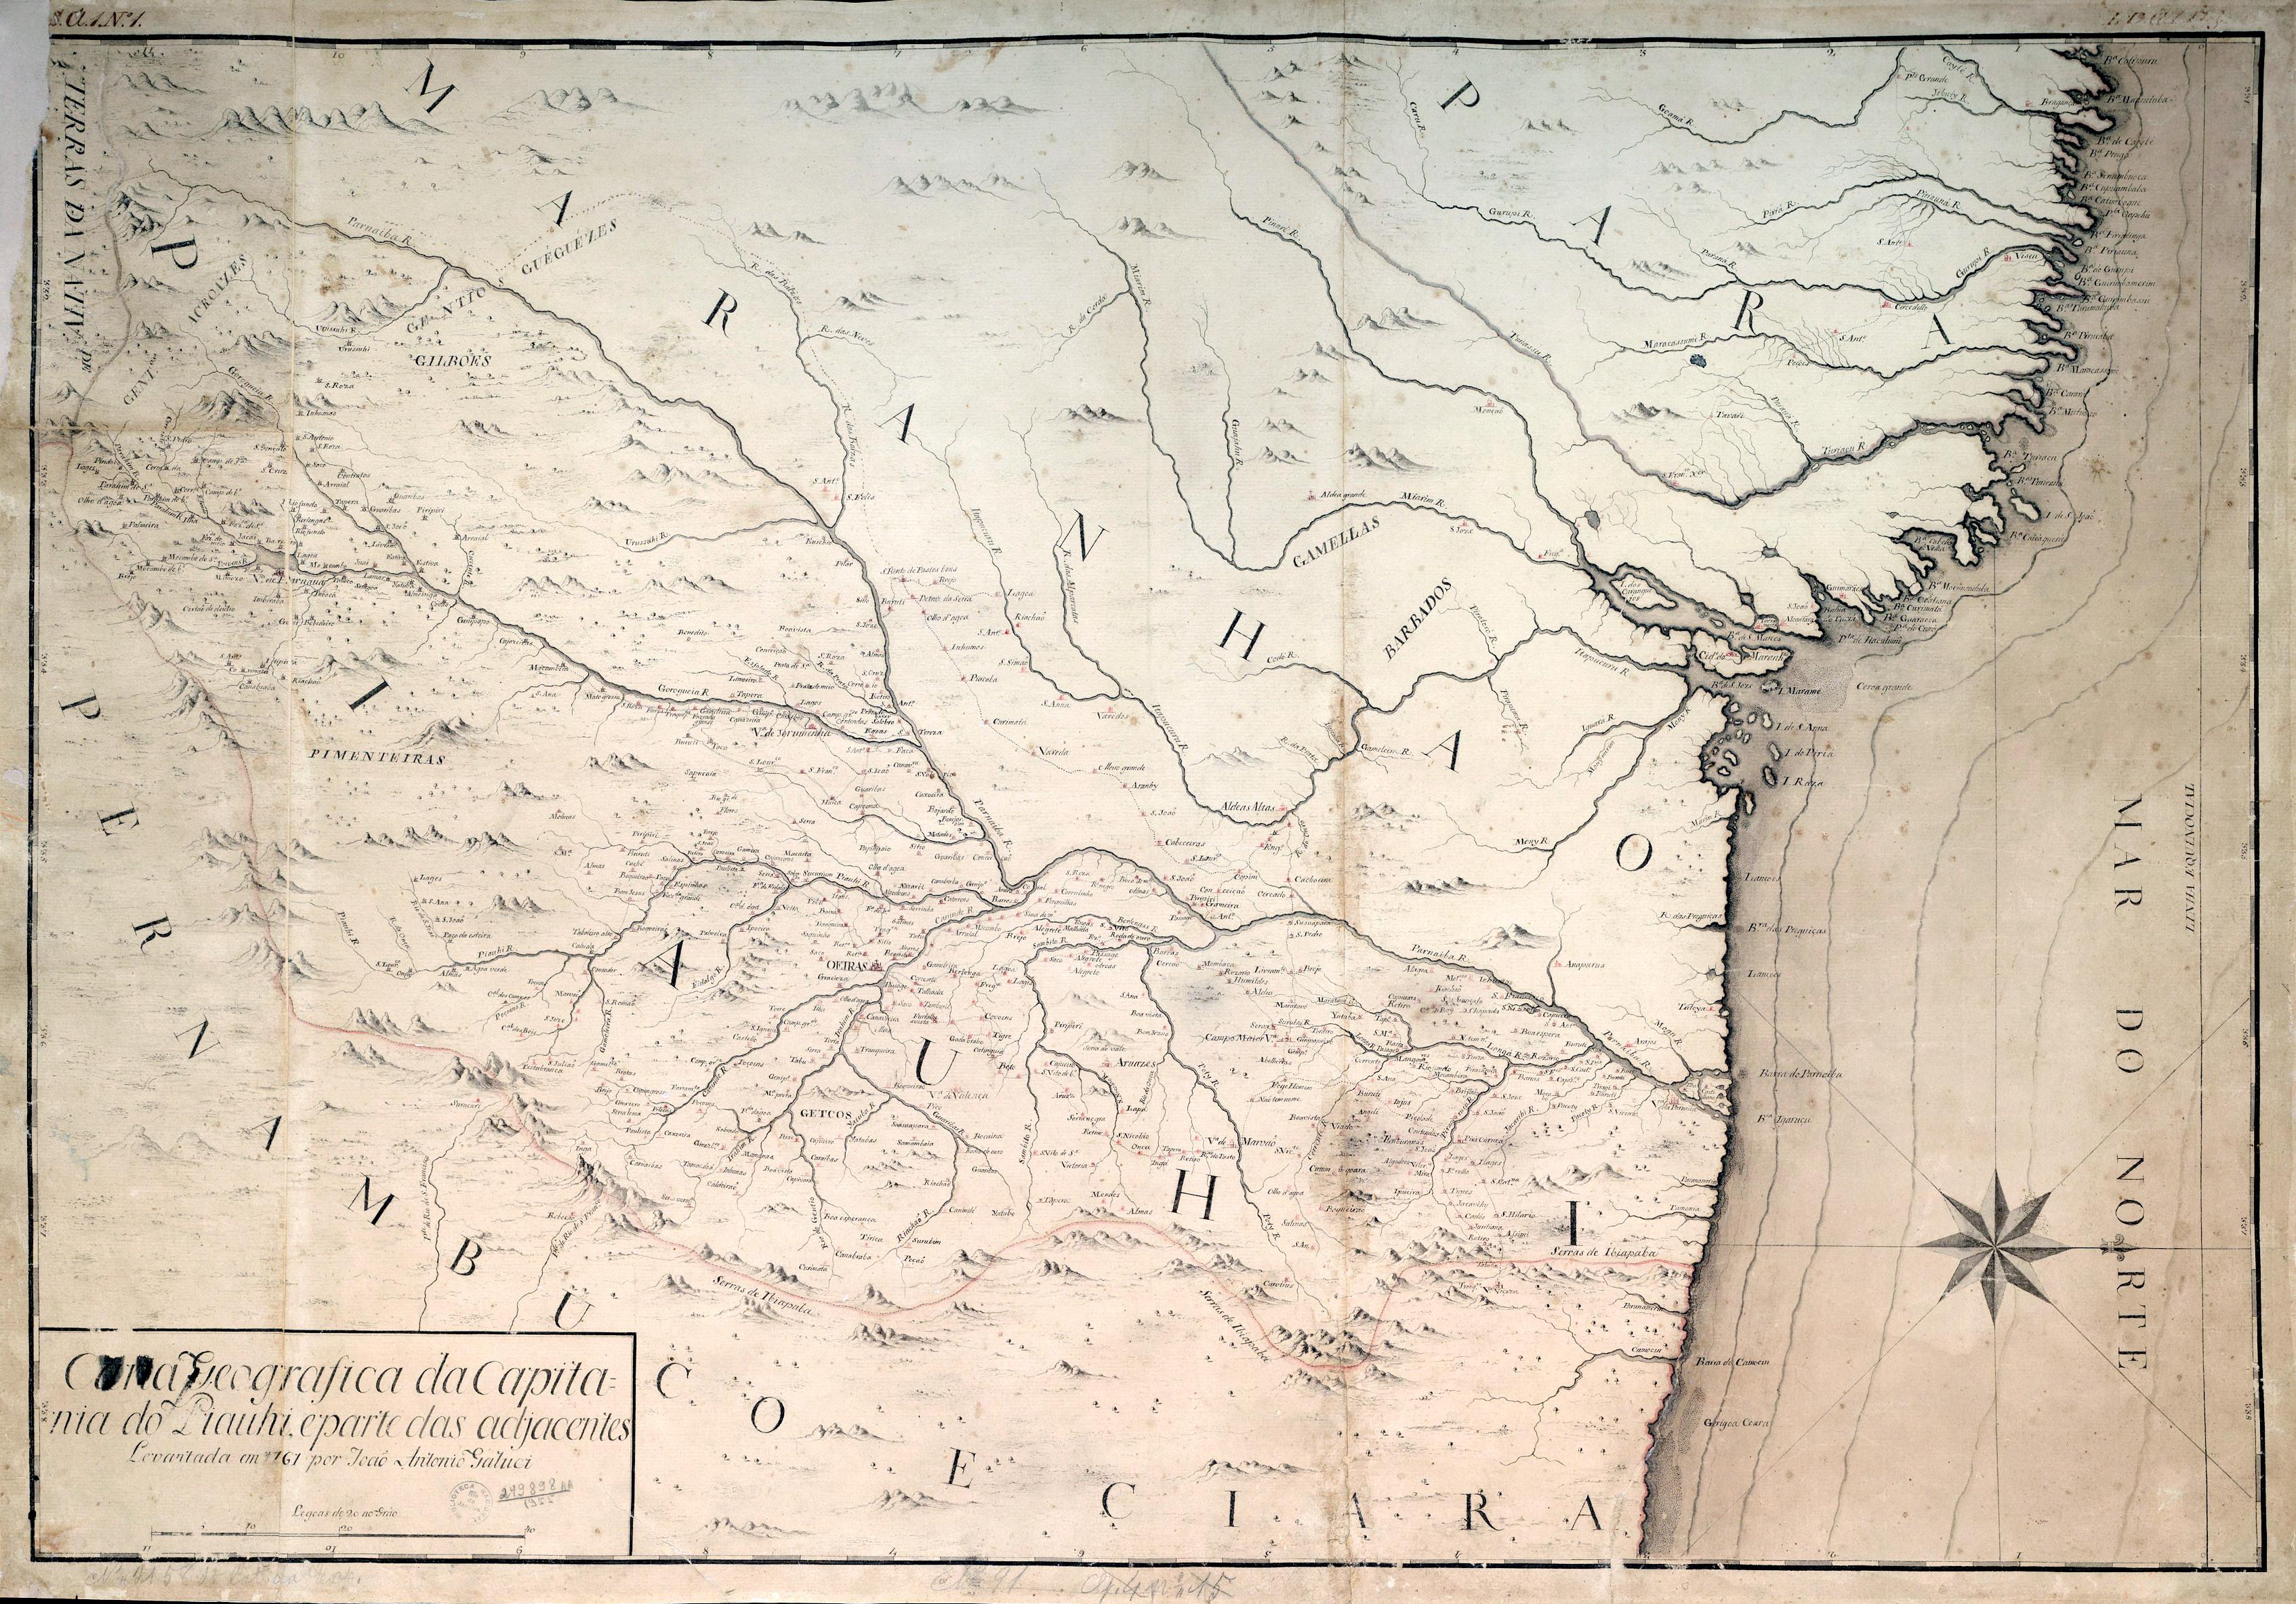 Filecarta Geografica Da Capitania Do Piauhi Galluzzi 1761jpg